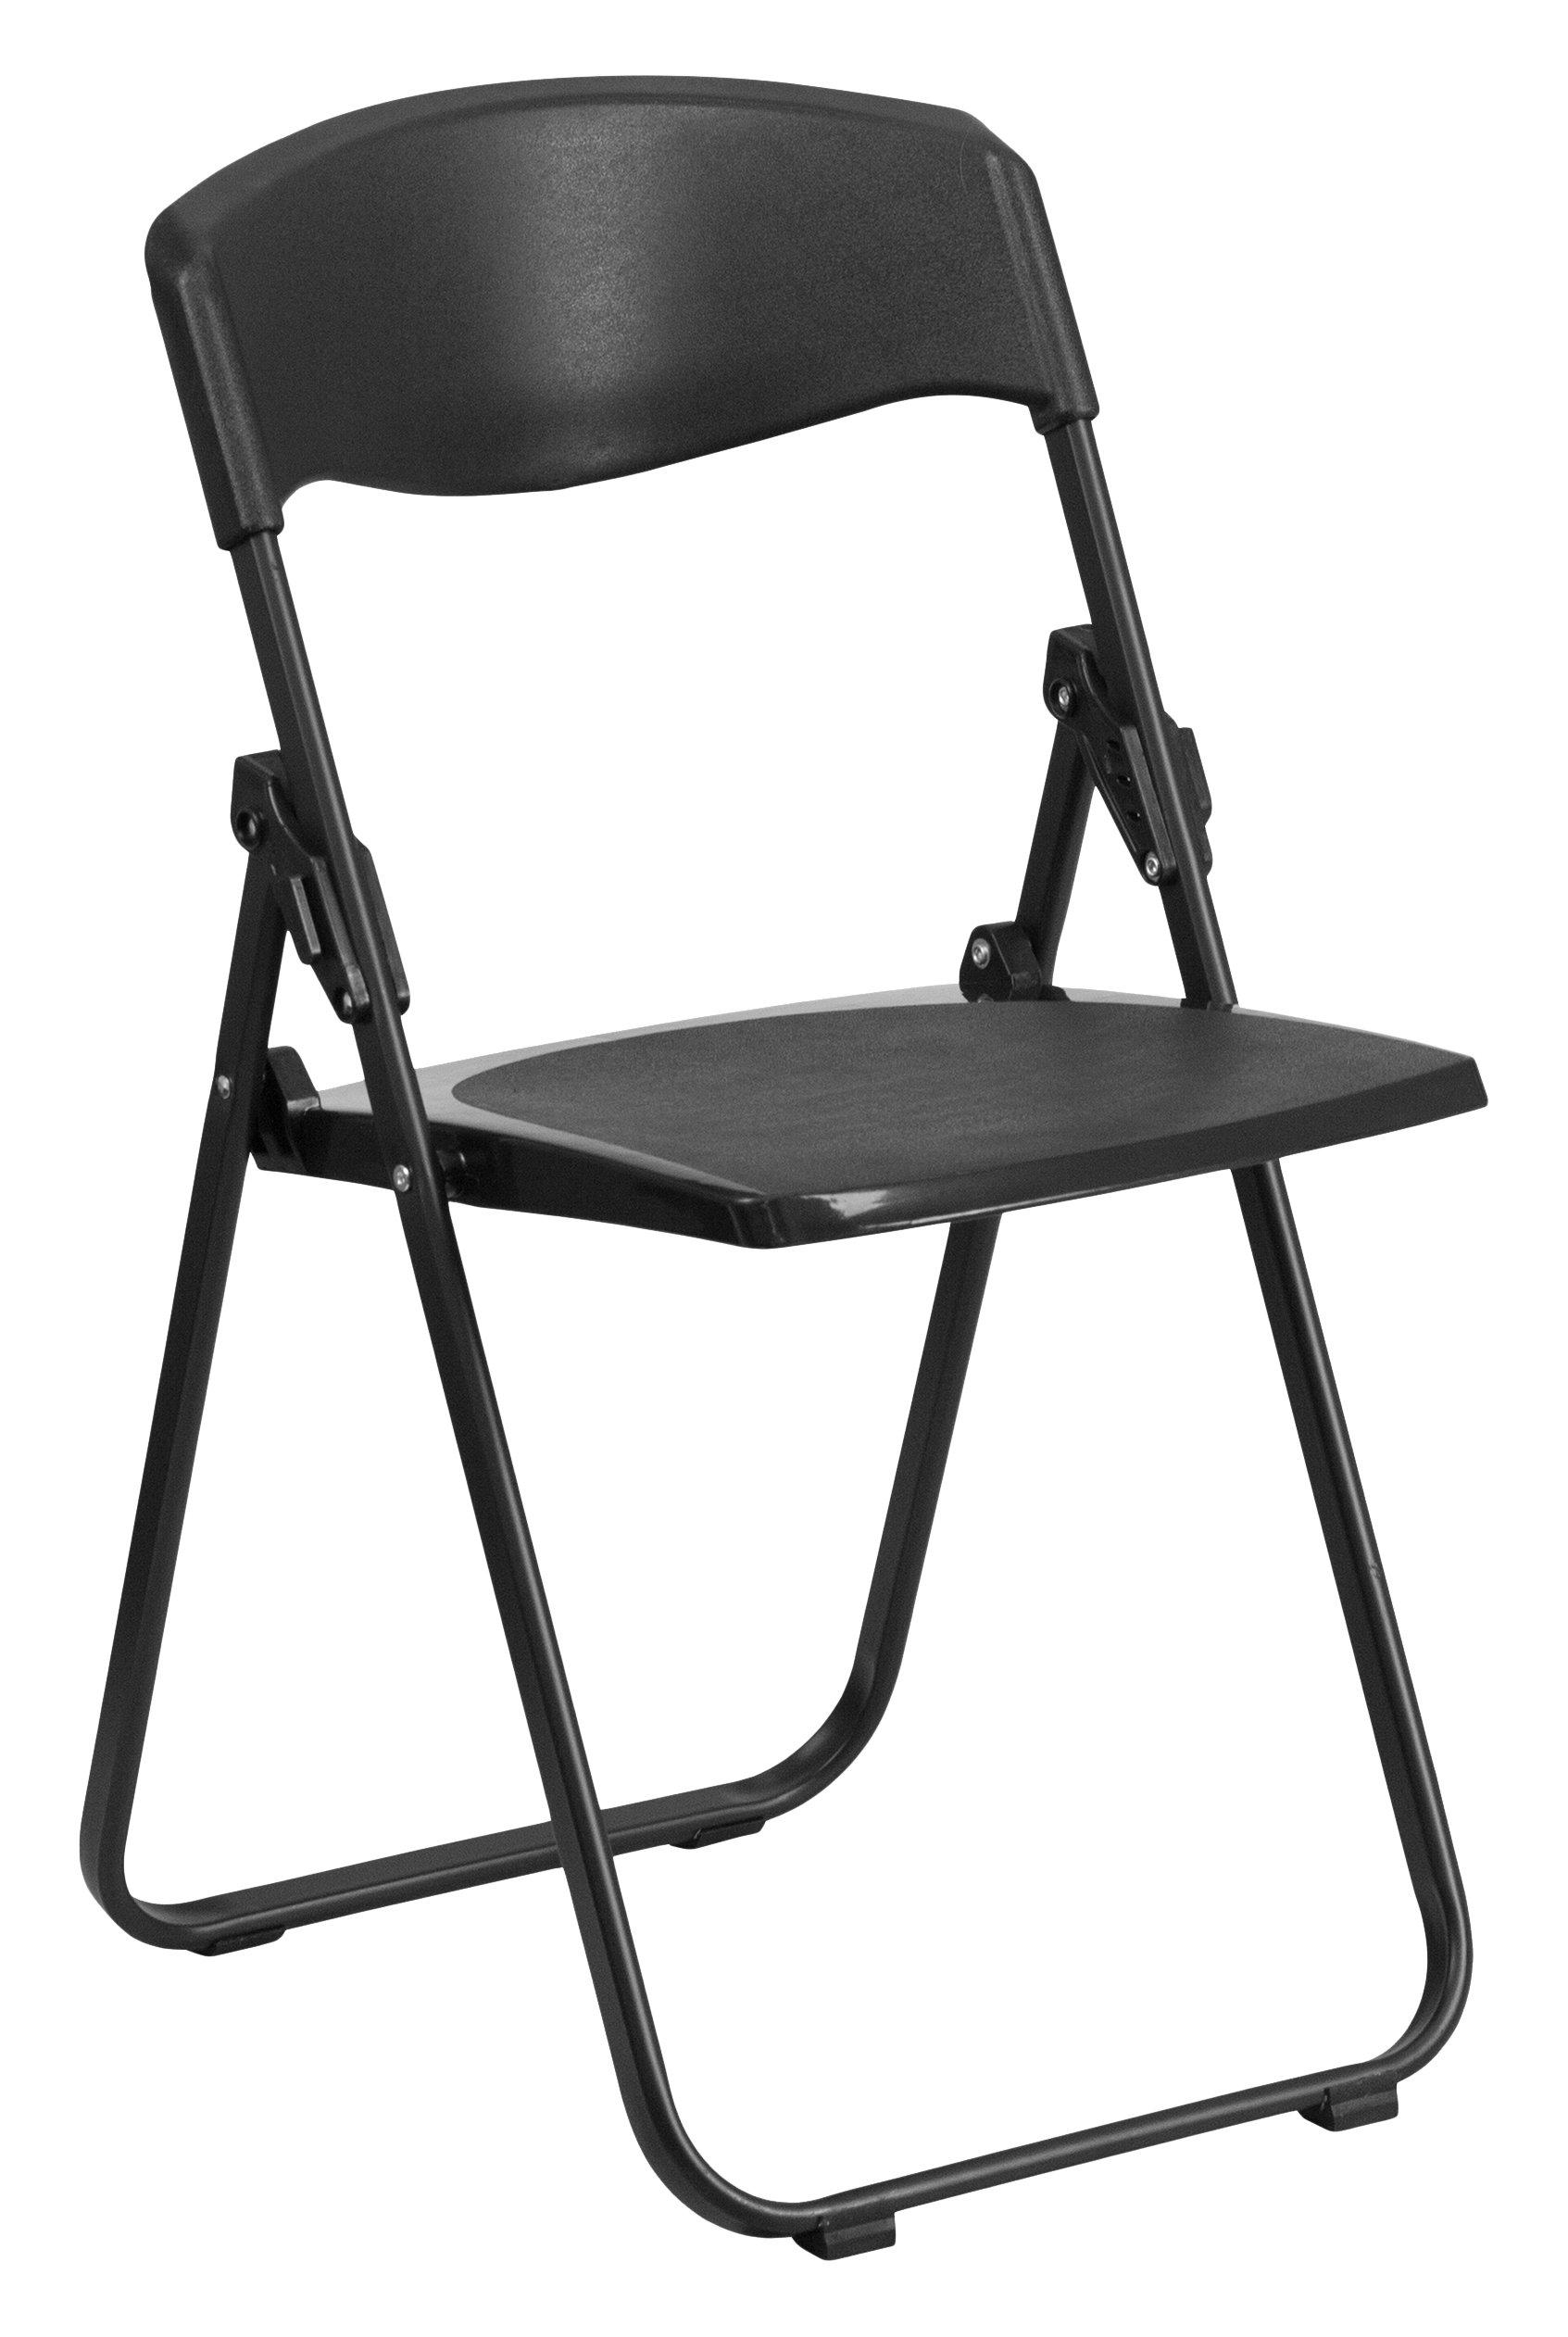 Flash Furniture 6 Pk. HERCULES Series 880 lb. Capacity Heavy Duty Black Plastic Folding Chair with Built-in Ganging Brackets